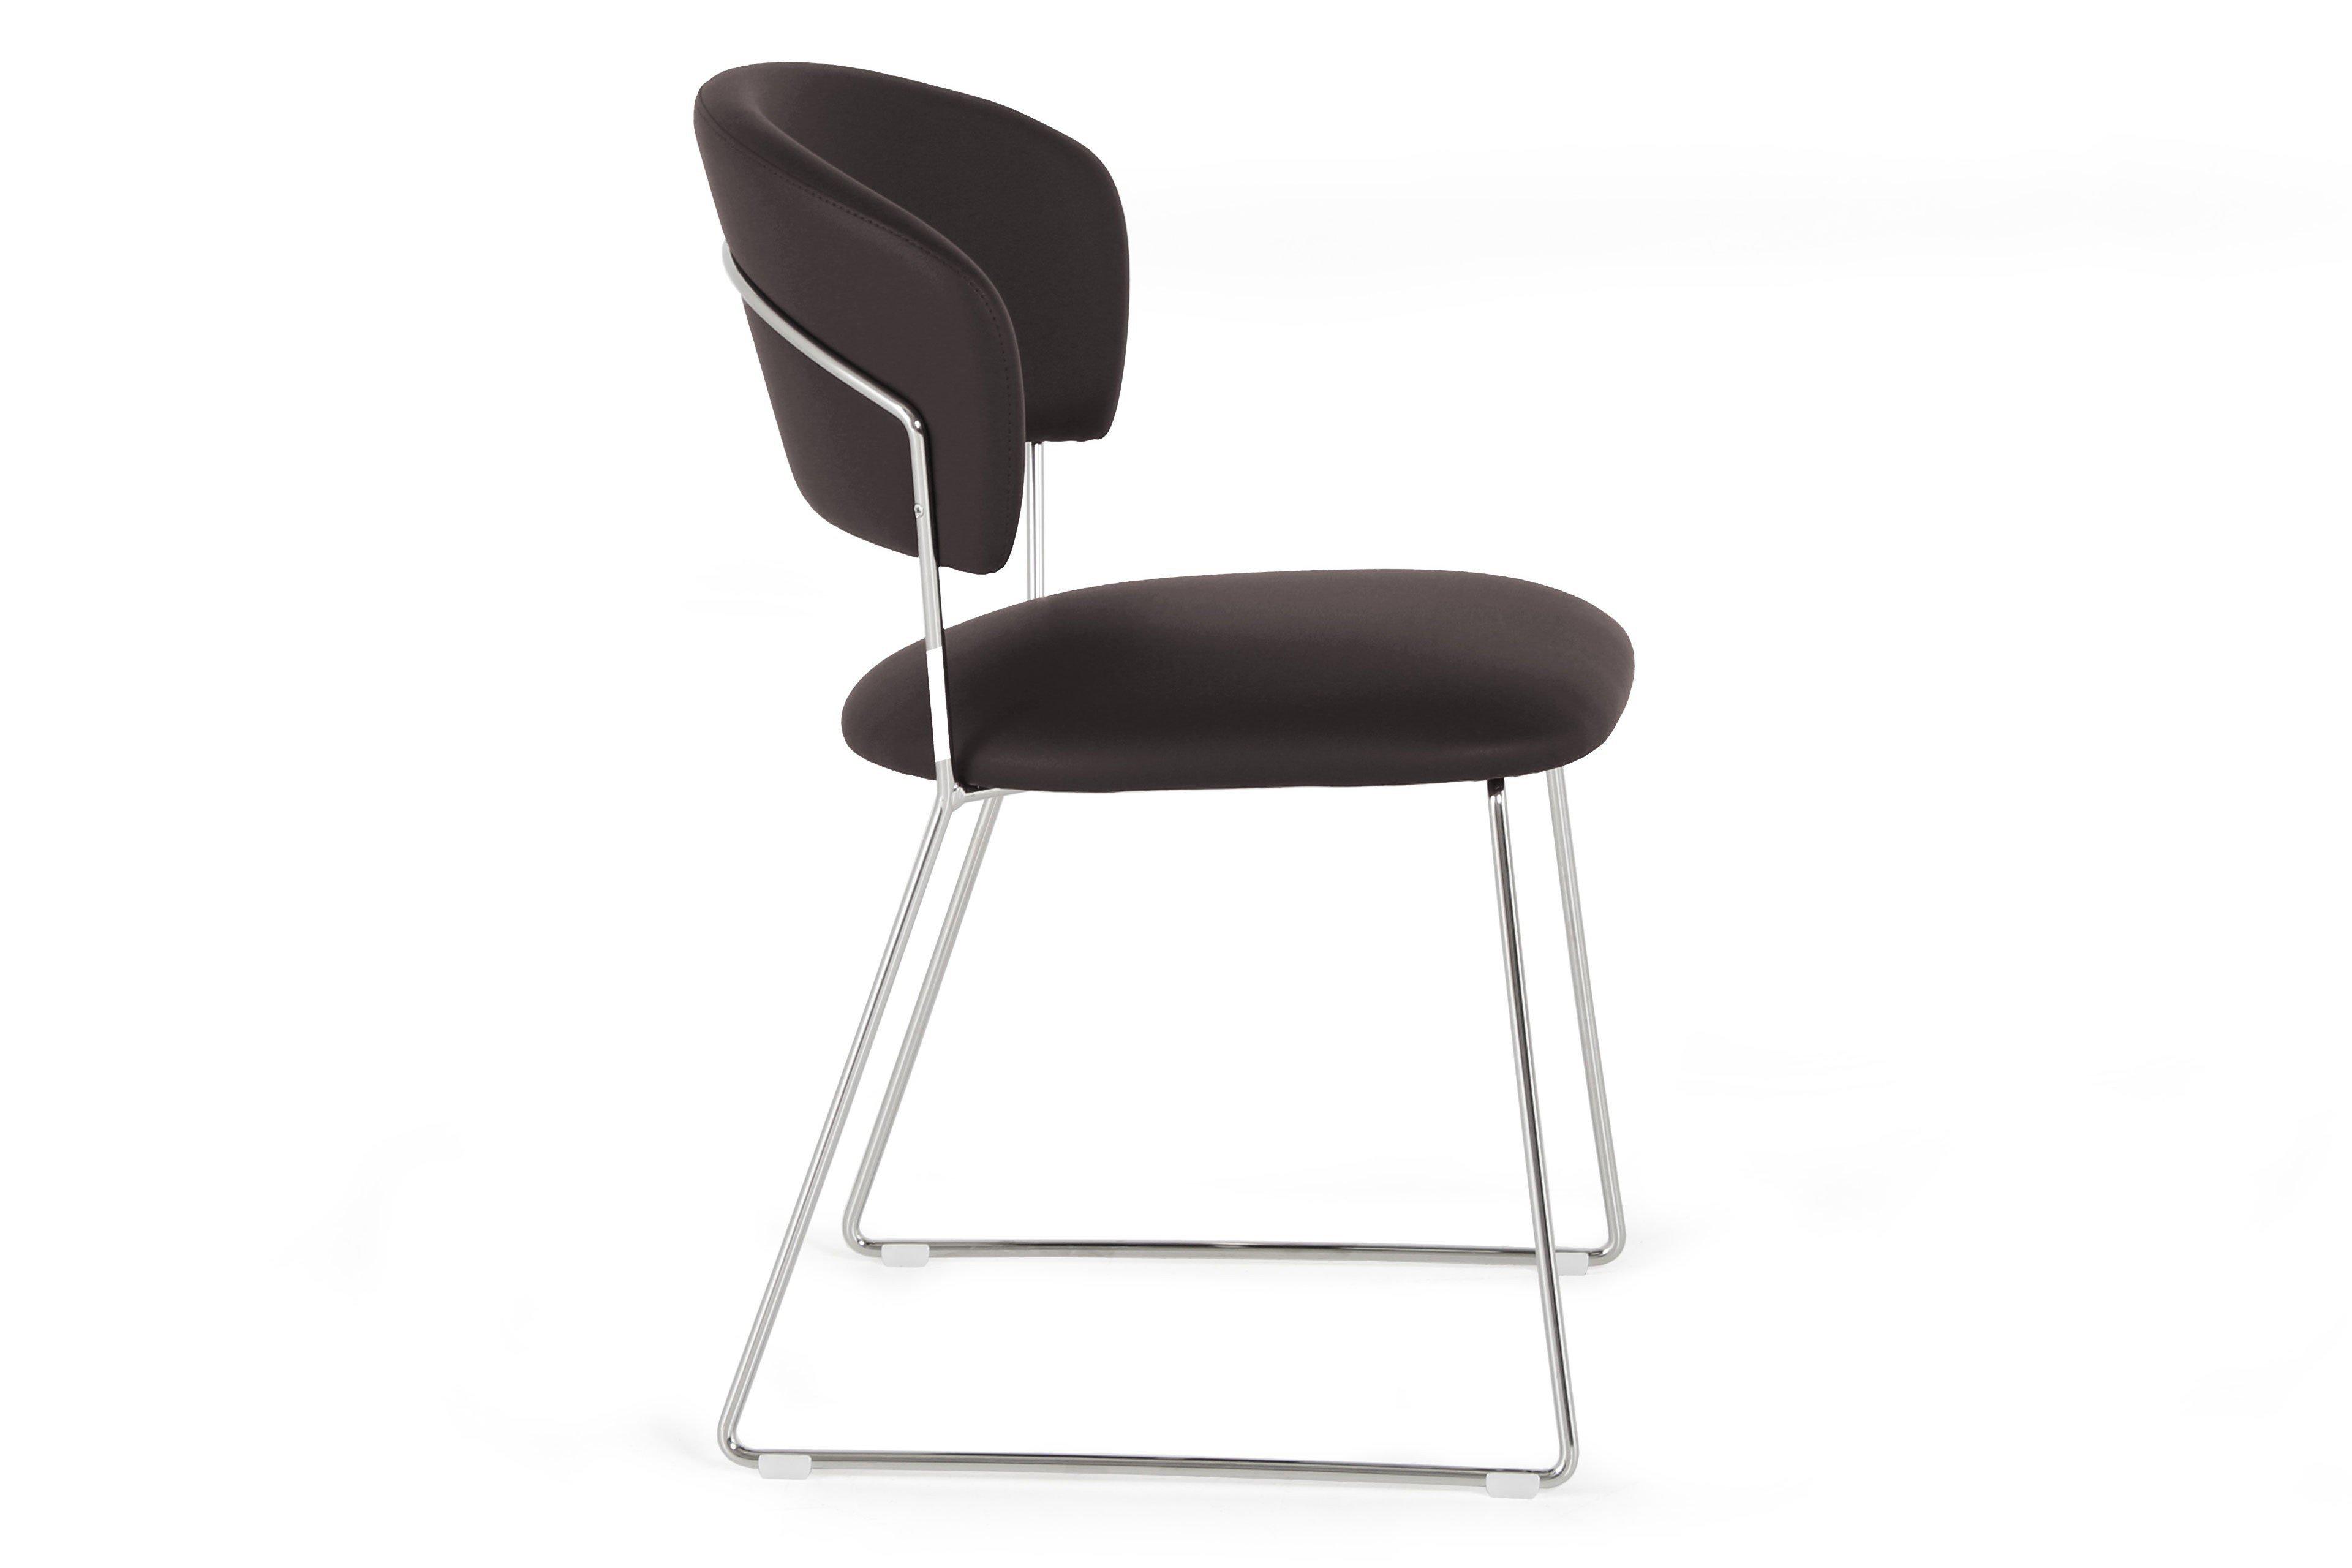 connubia by calligaris stuhl atlantis verchromt kaffee m bel letz ihr online shop. Black Bedroom Furniture Sets. Home Design Ideas